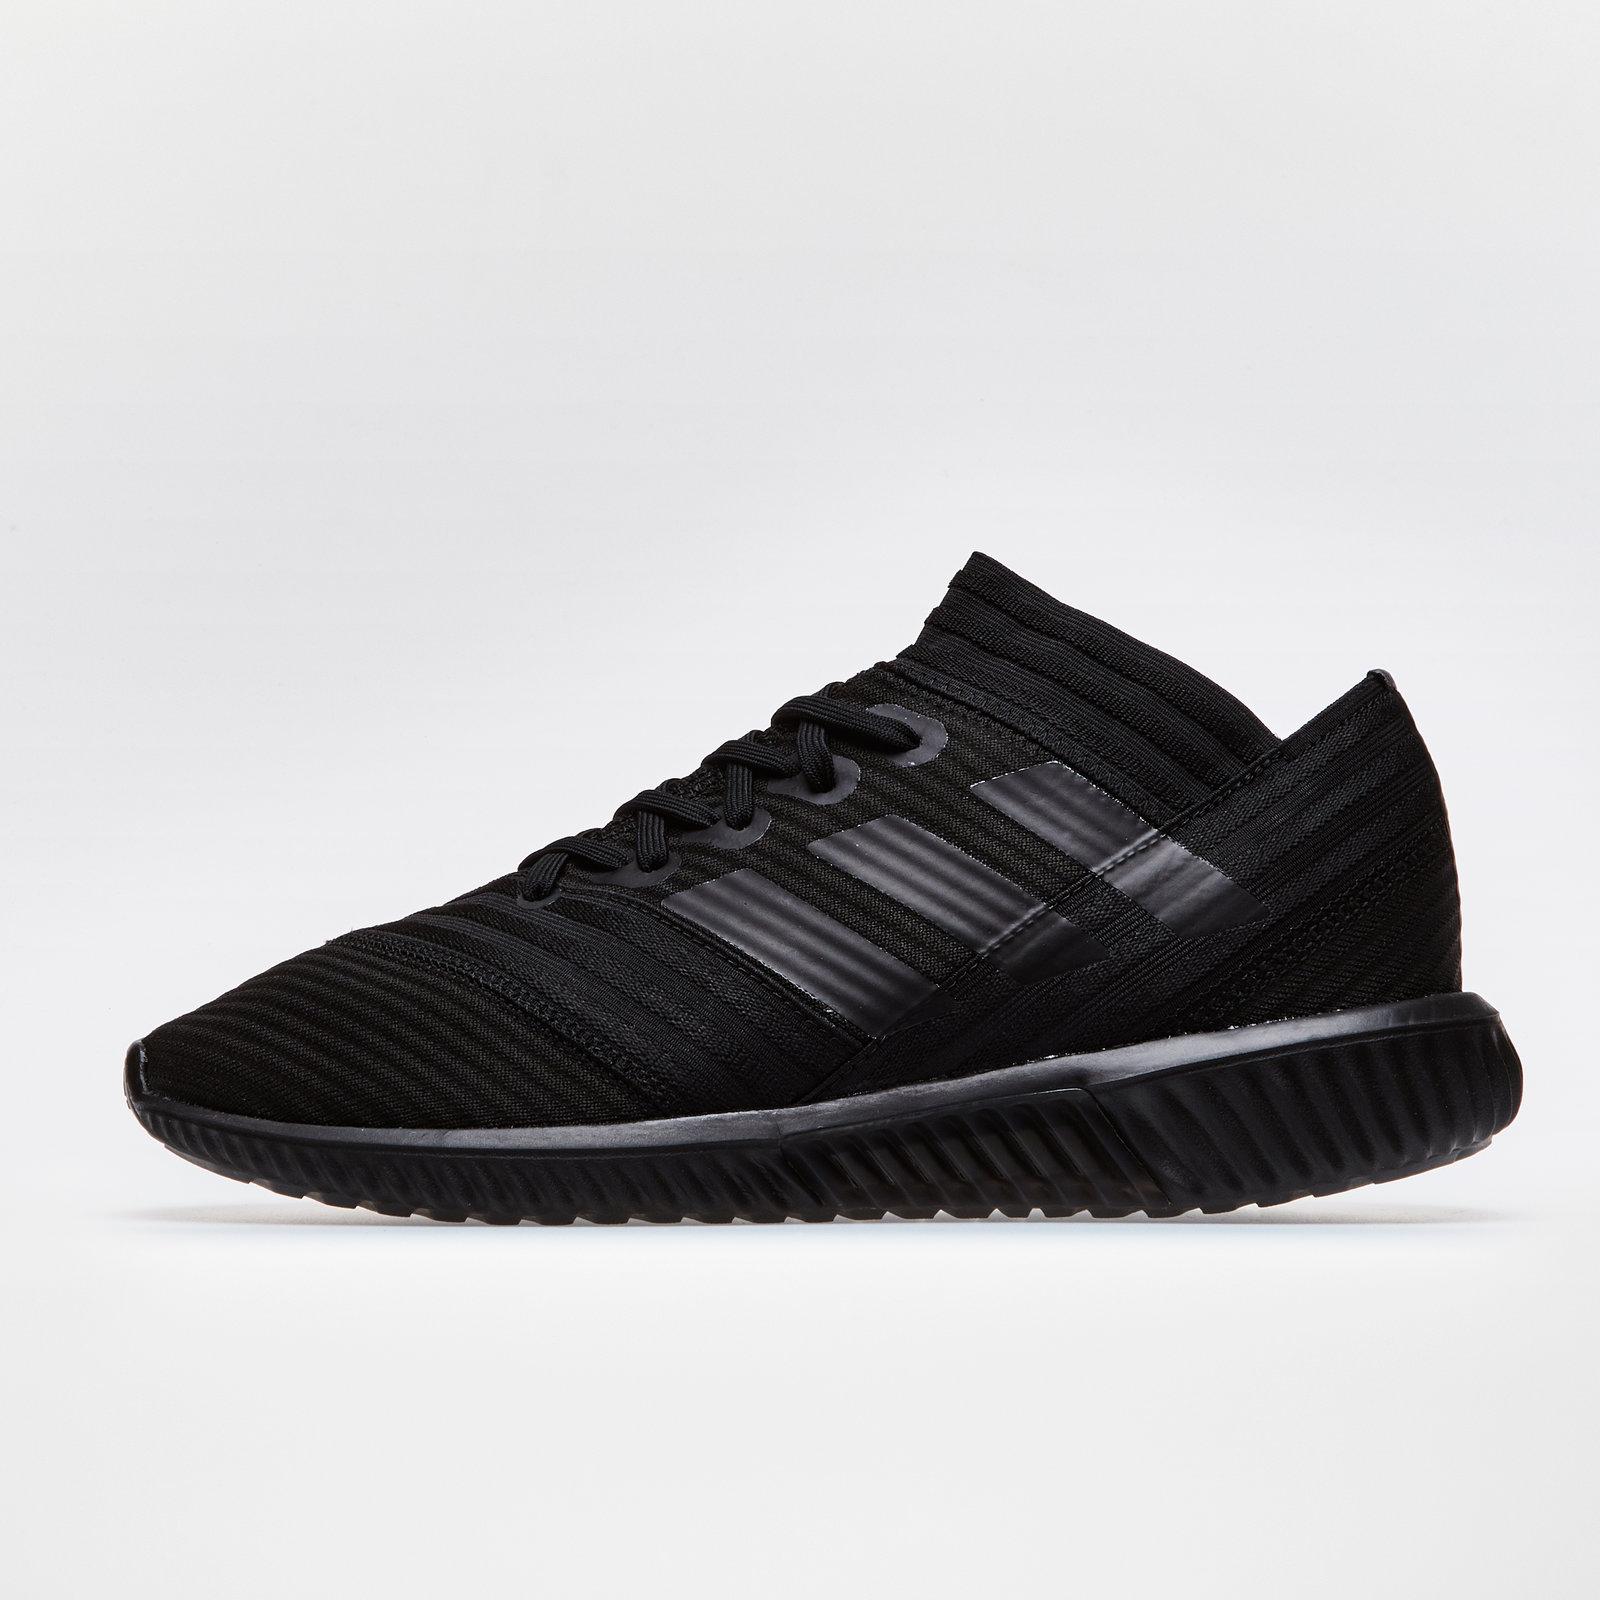 6eb119113a46 adidas Mens Nemeziz Tango 17.1 Football Boots Studs Trainers Sports Shoes  Black